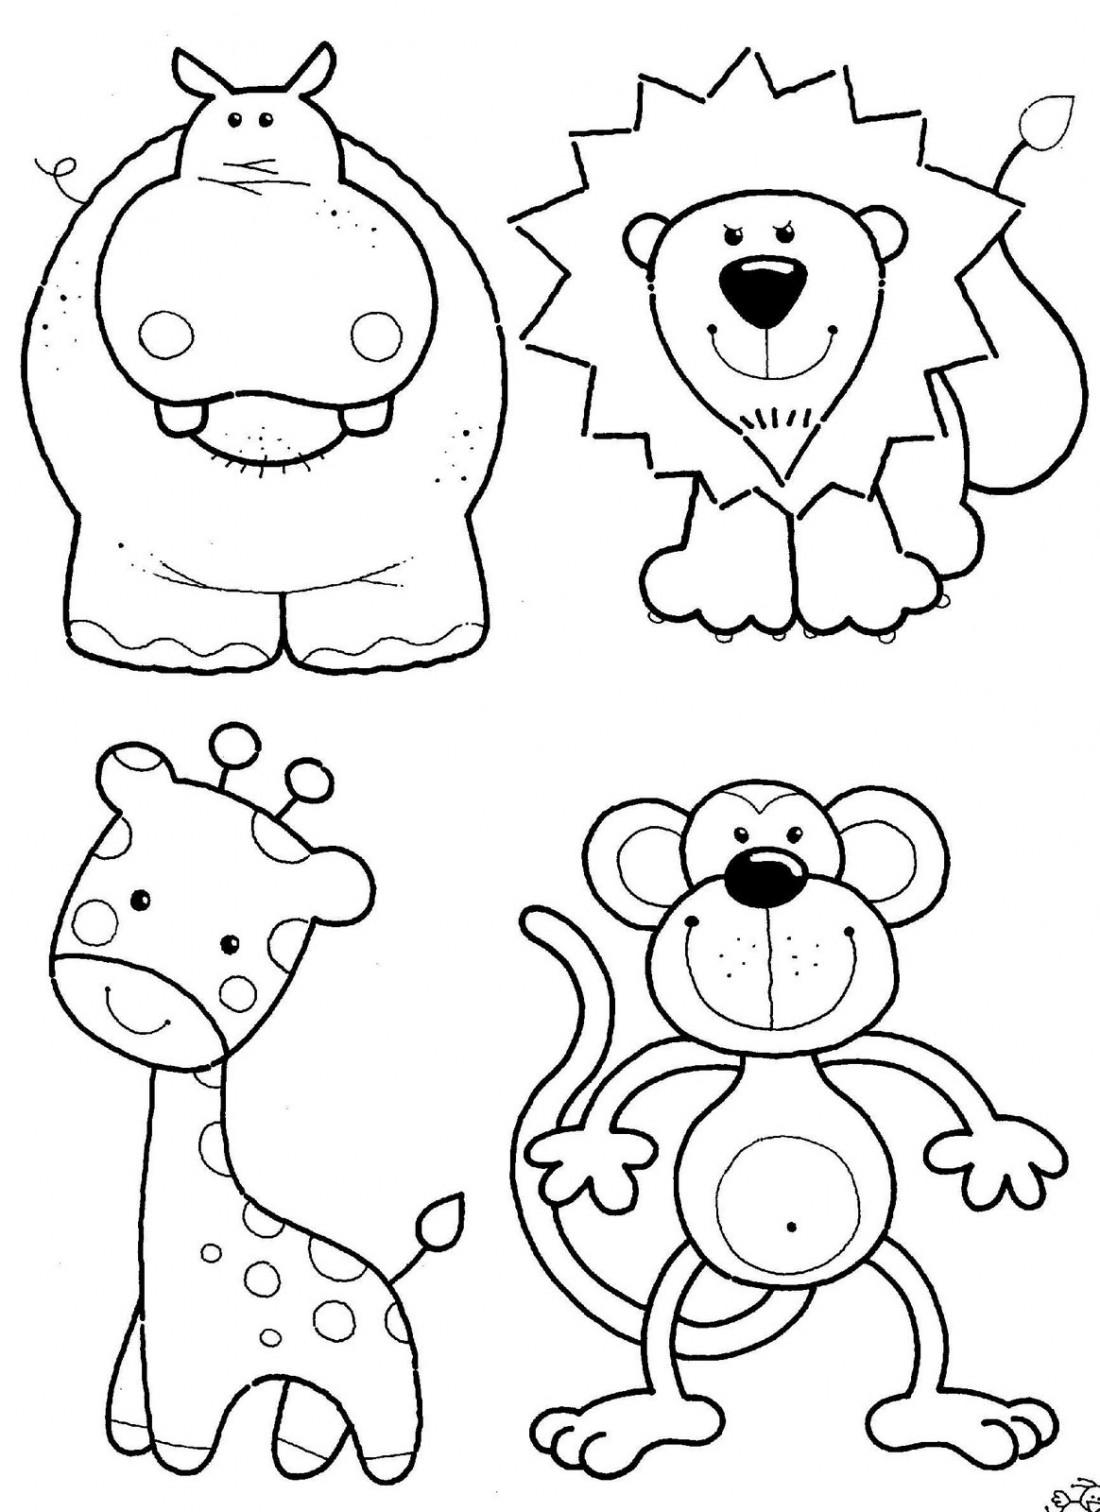 Coloring Pages Kids Com